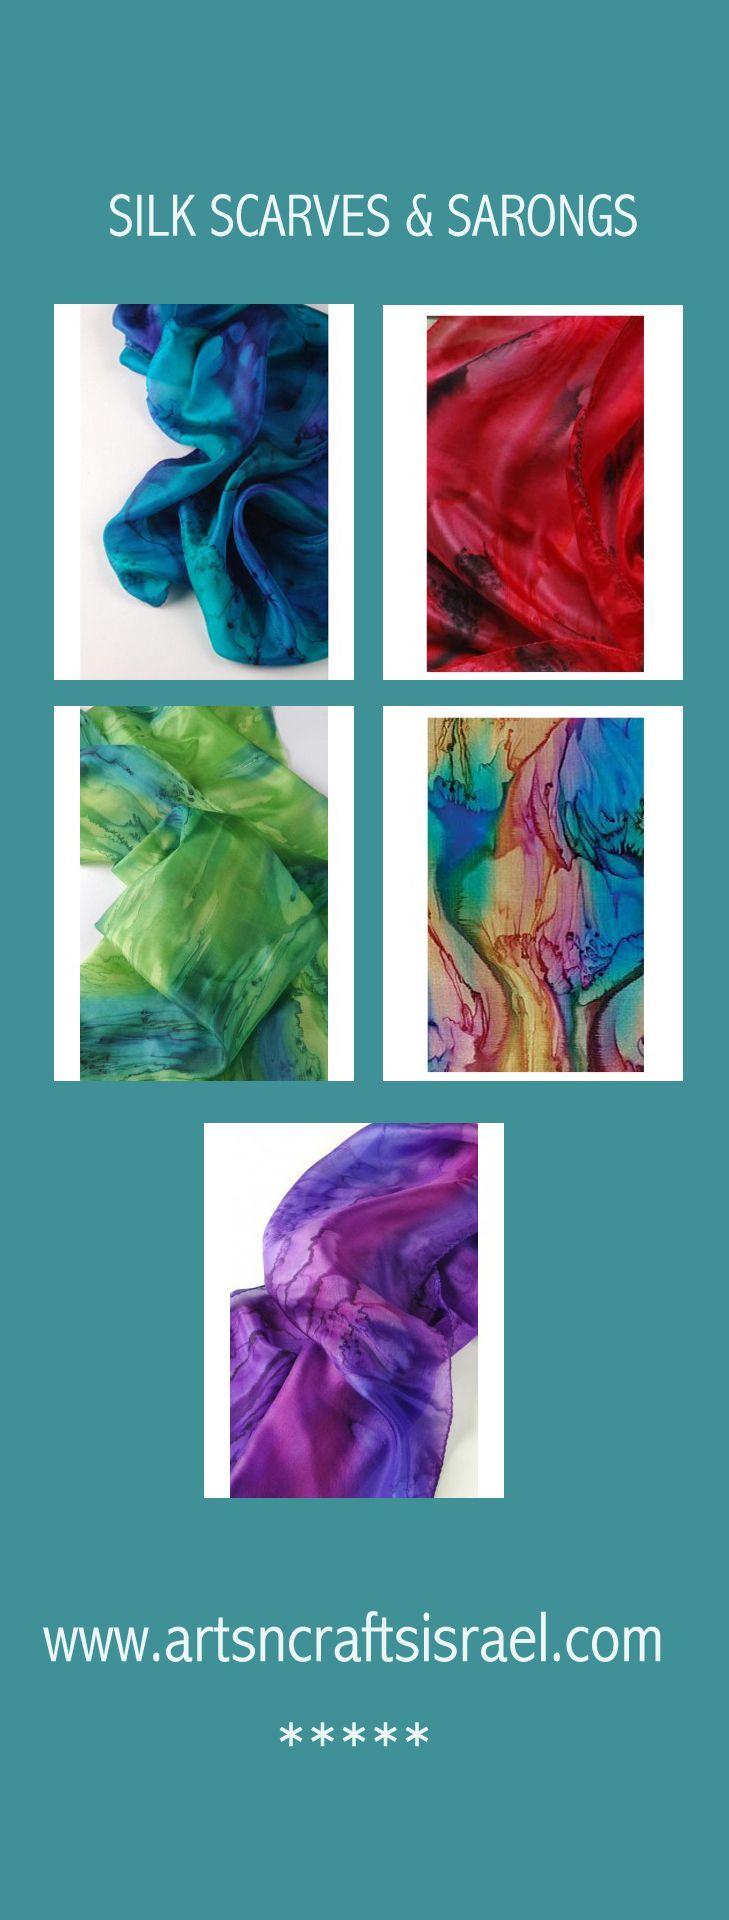 64 best Silk Accessories images on Pinterest | Fashion ...